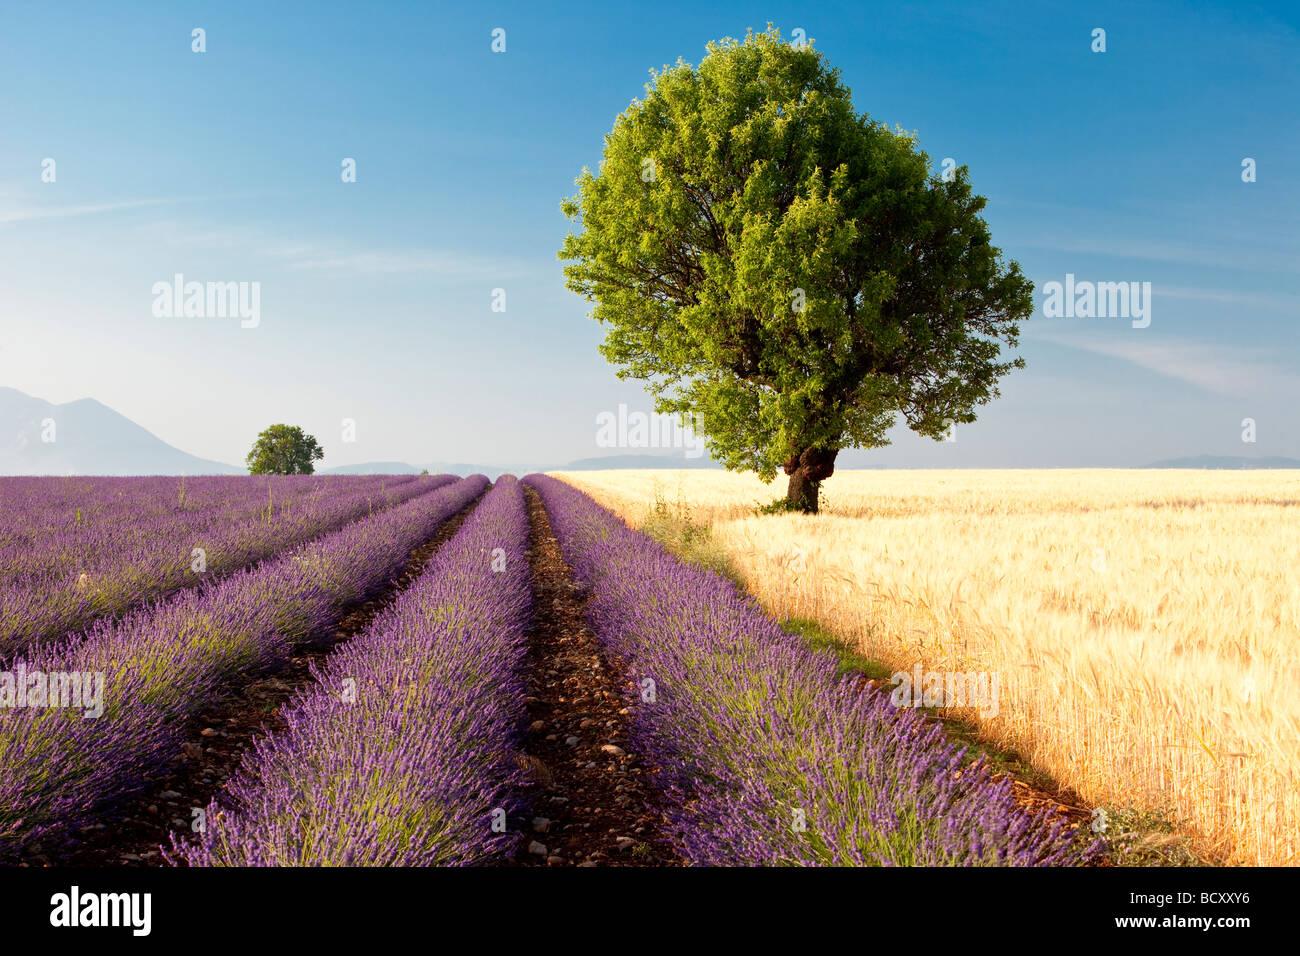 Lavender field near Valensole France - Stock Image